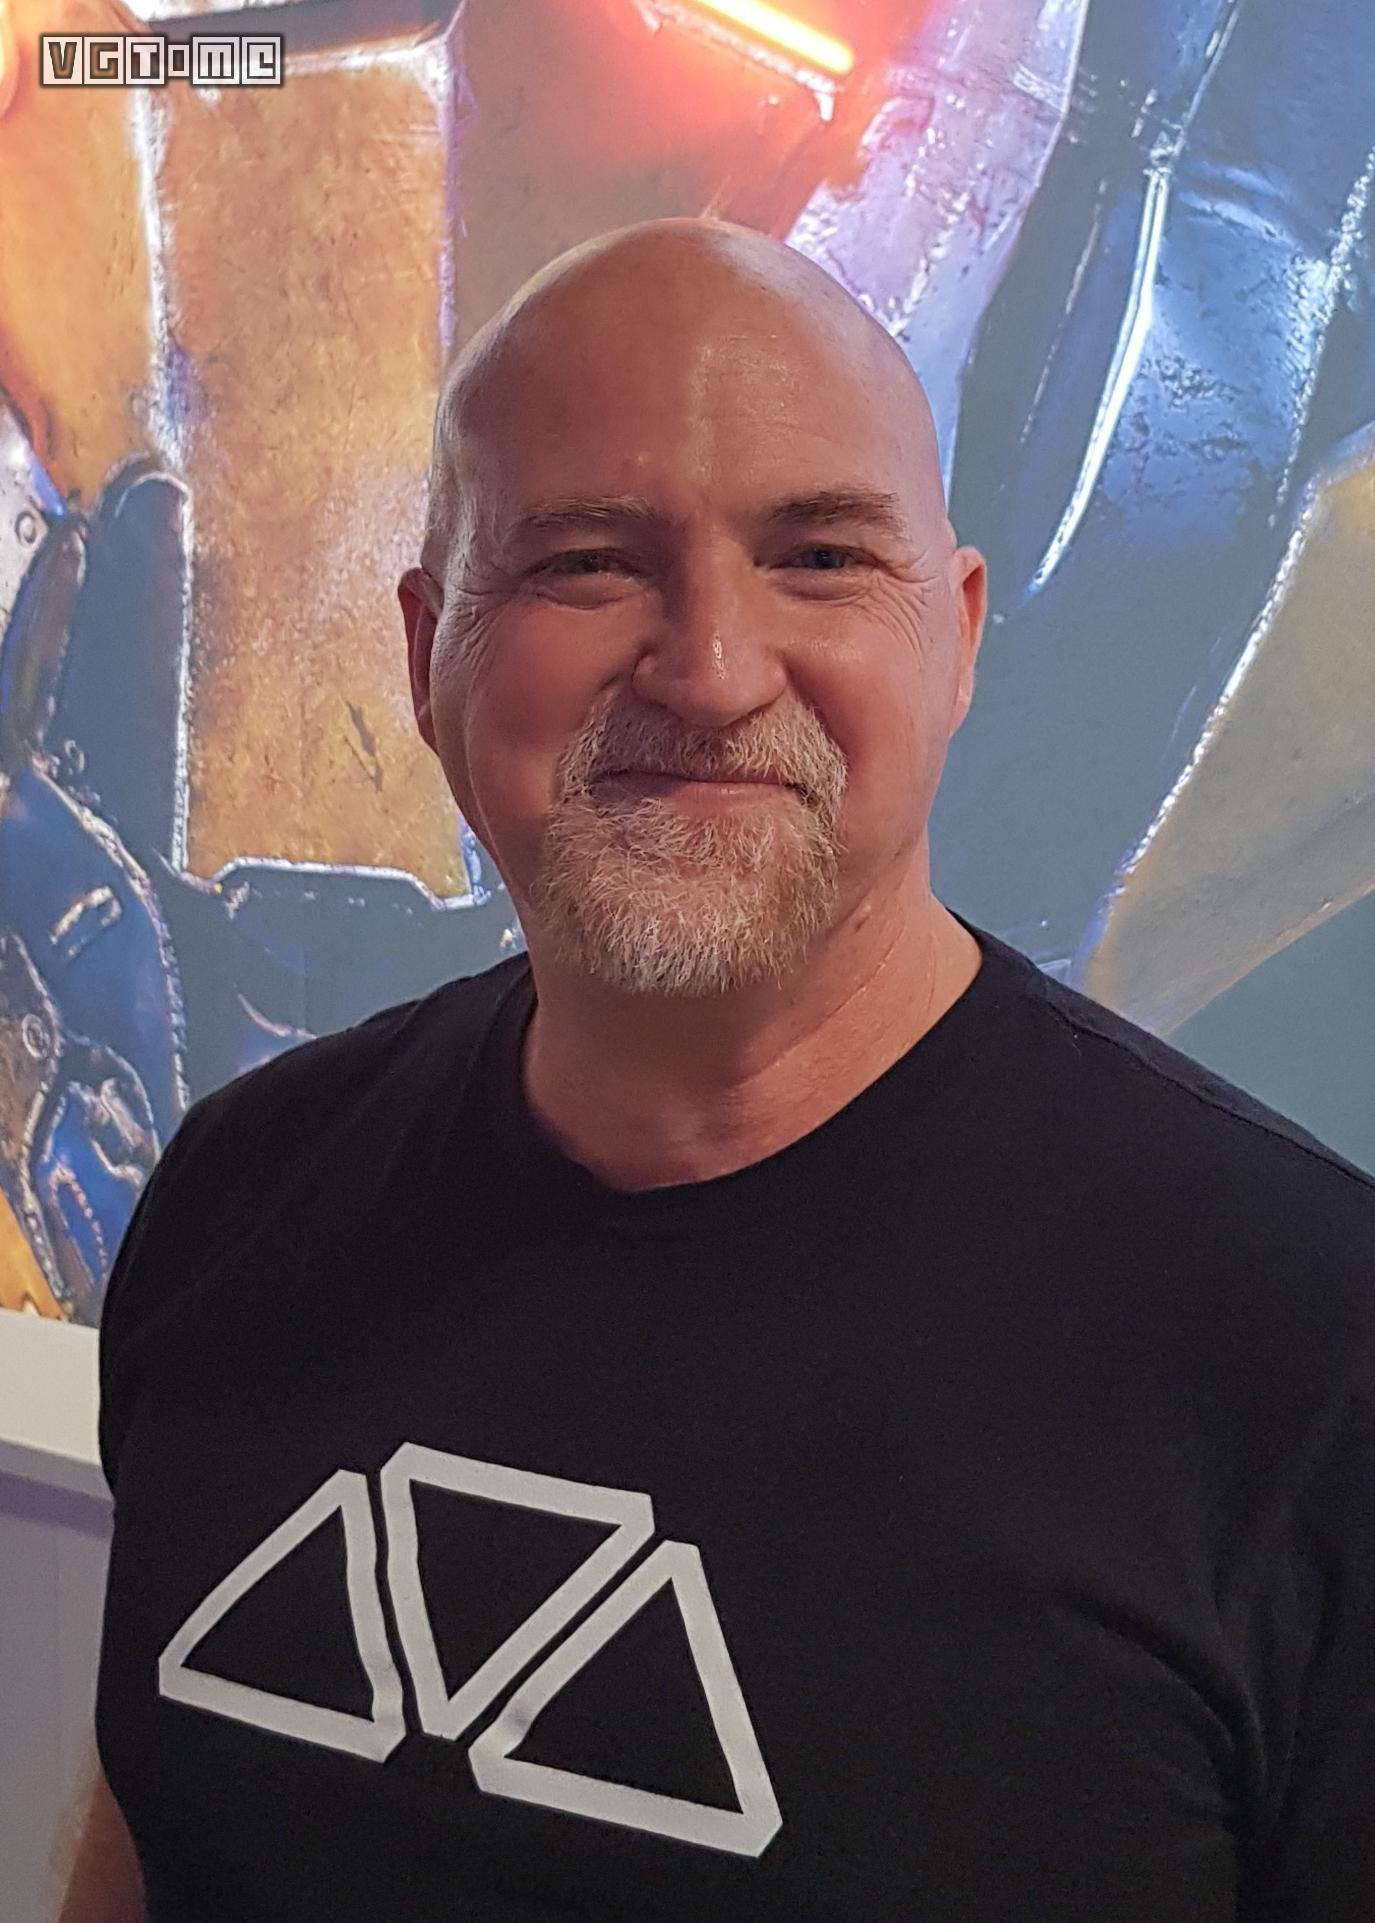 BioWare制作人说,《圣歌》是团队集大成之作